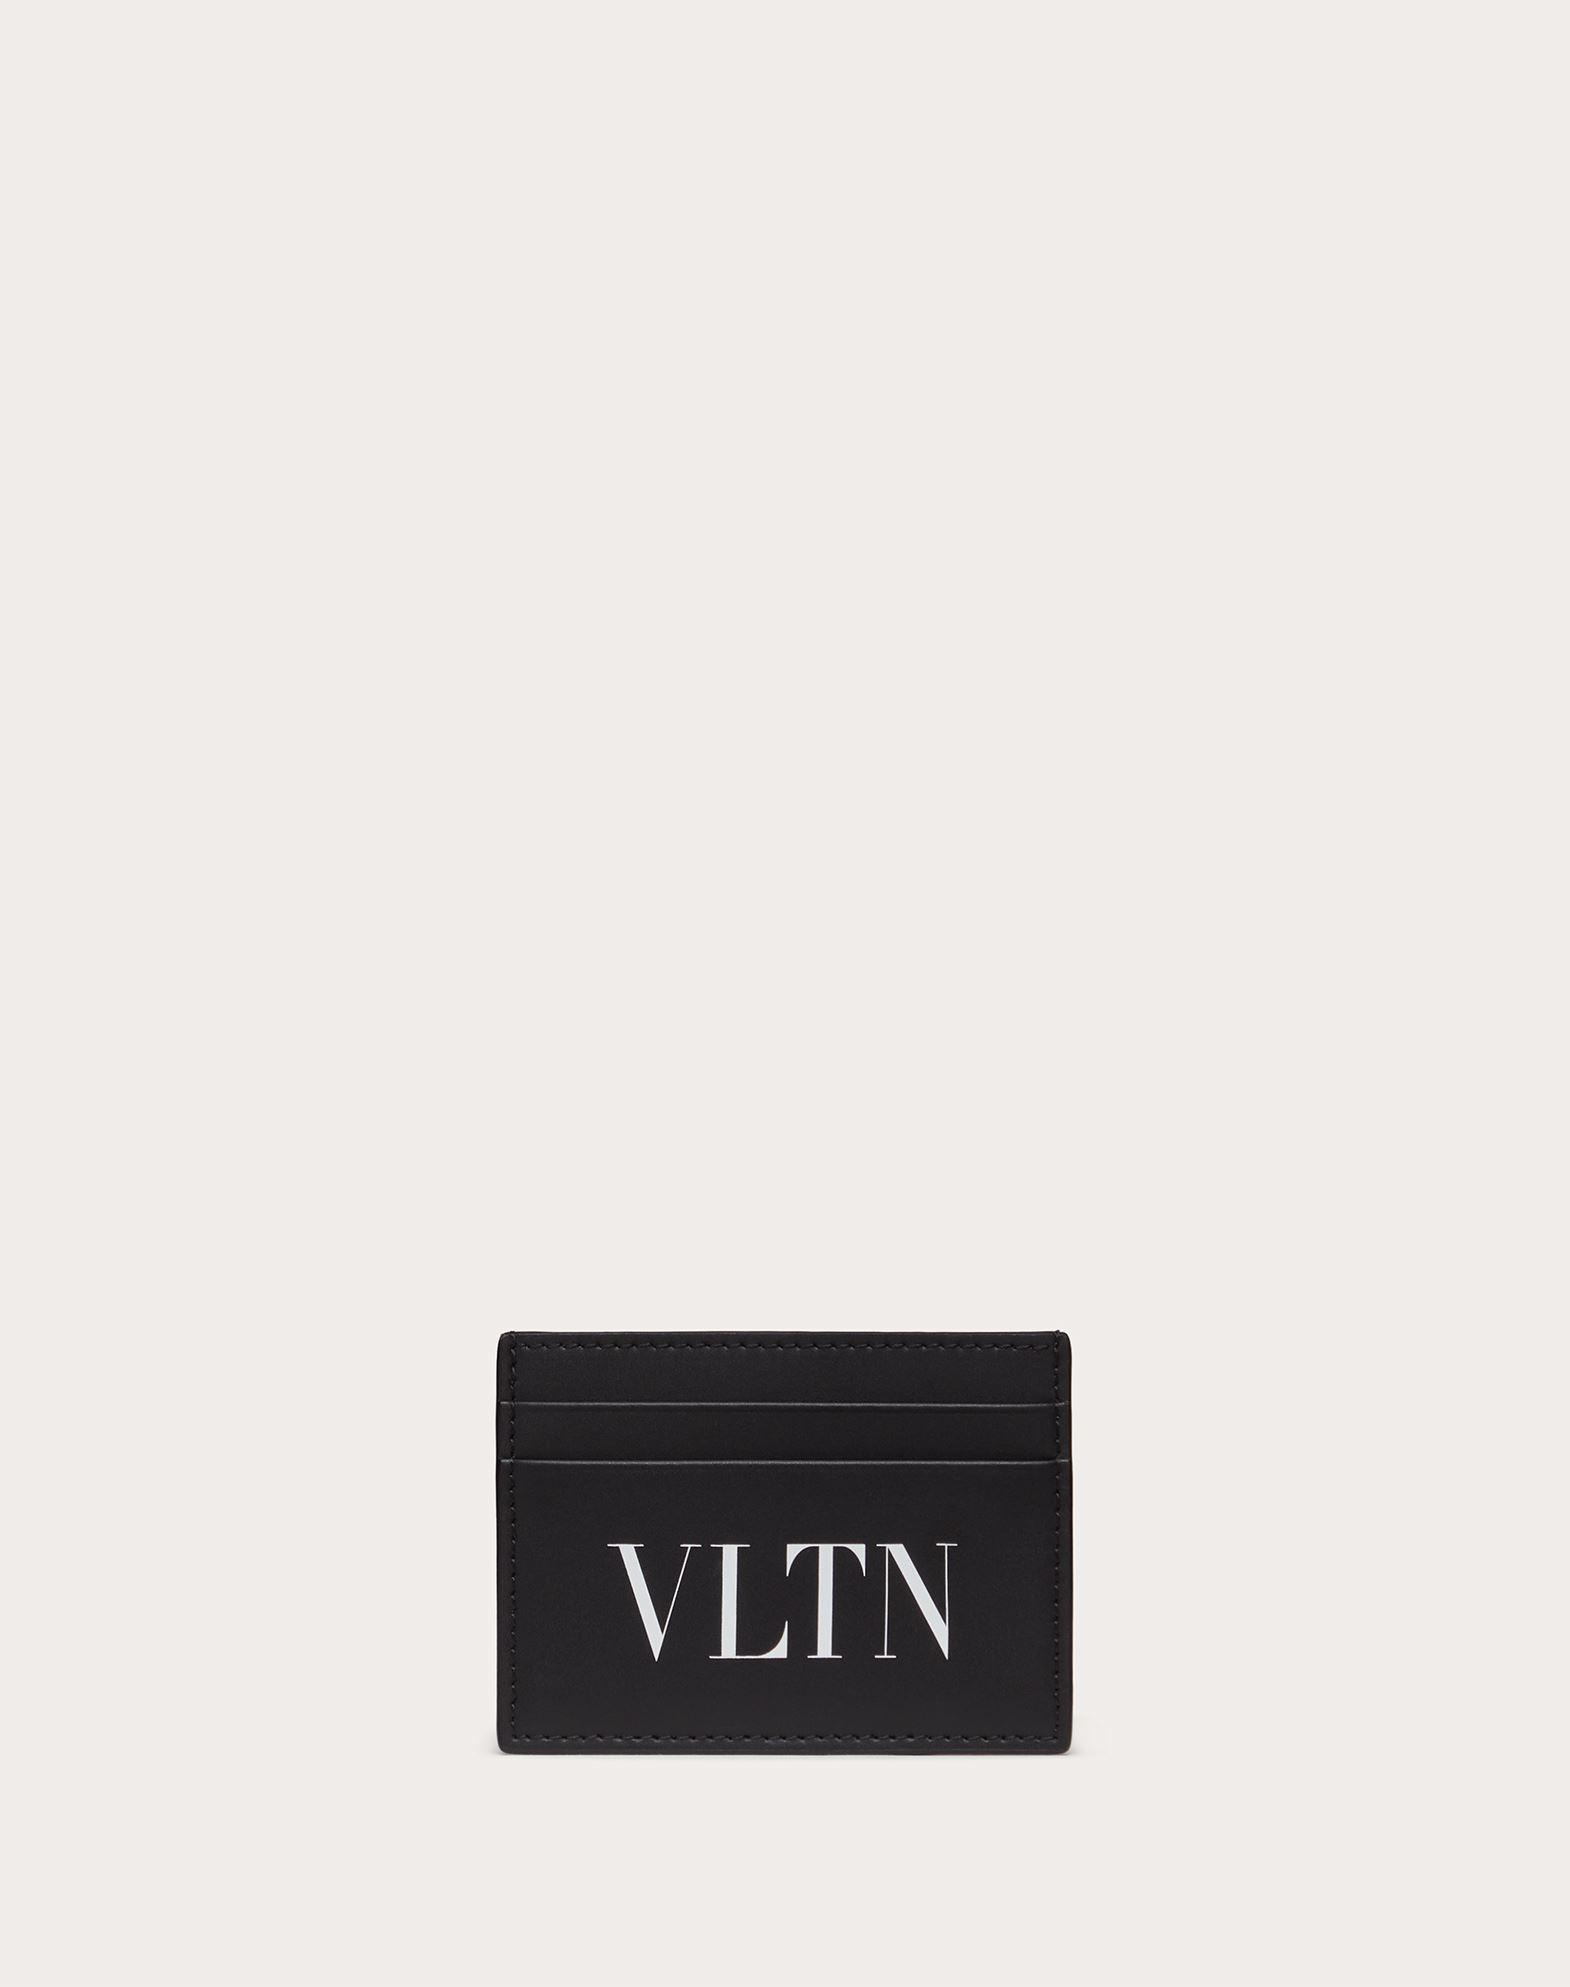 Portacarte VLTN